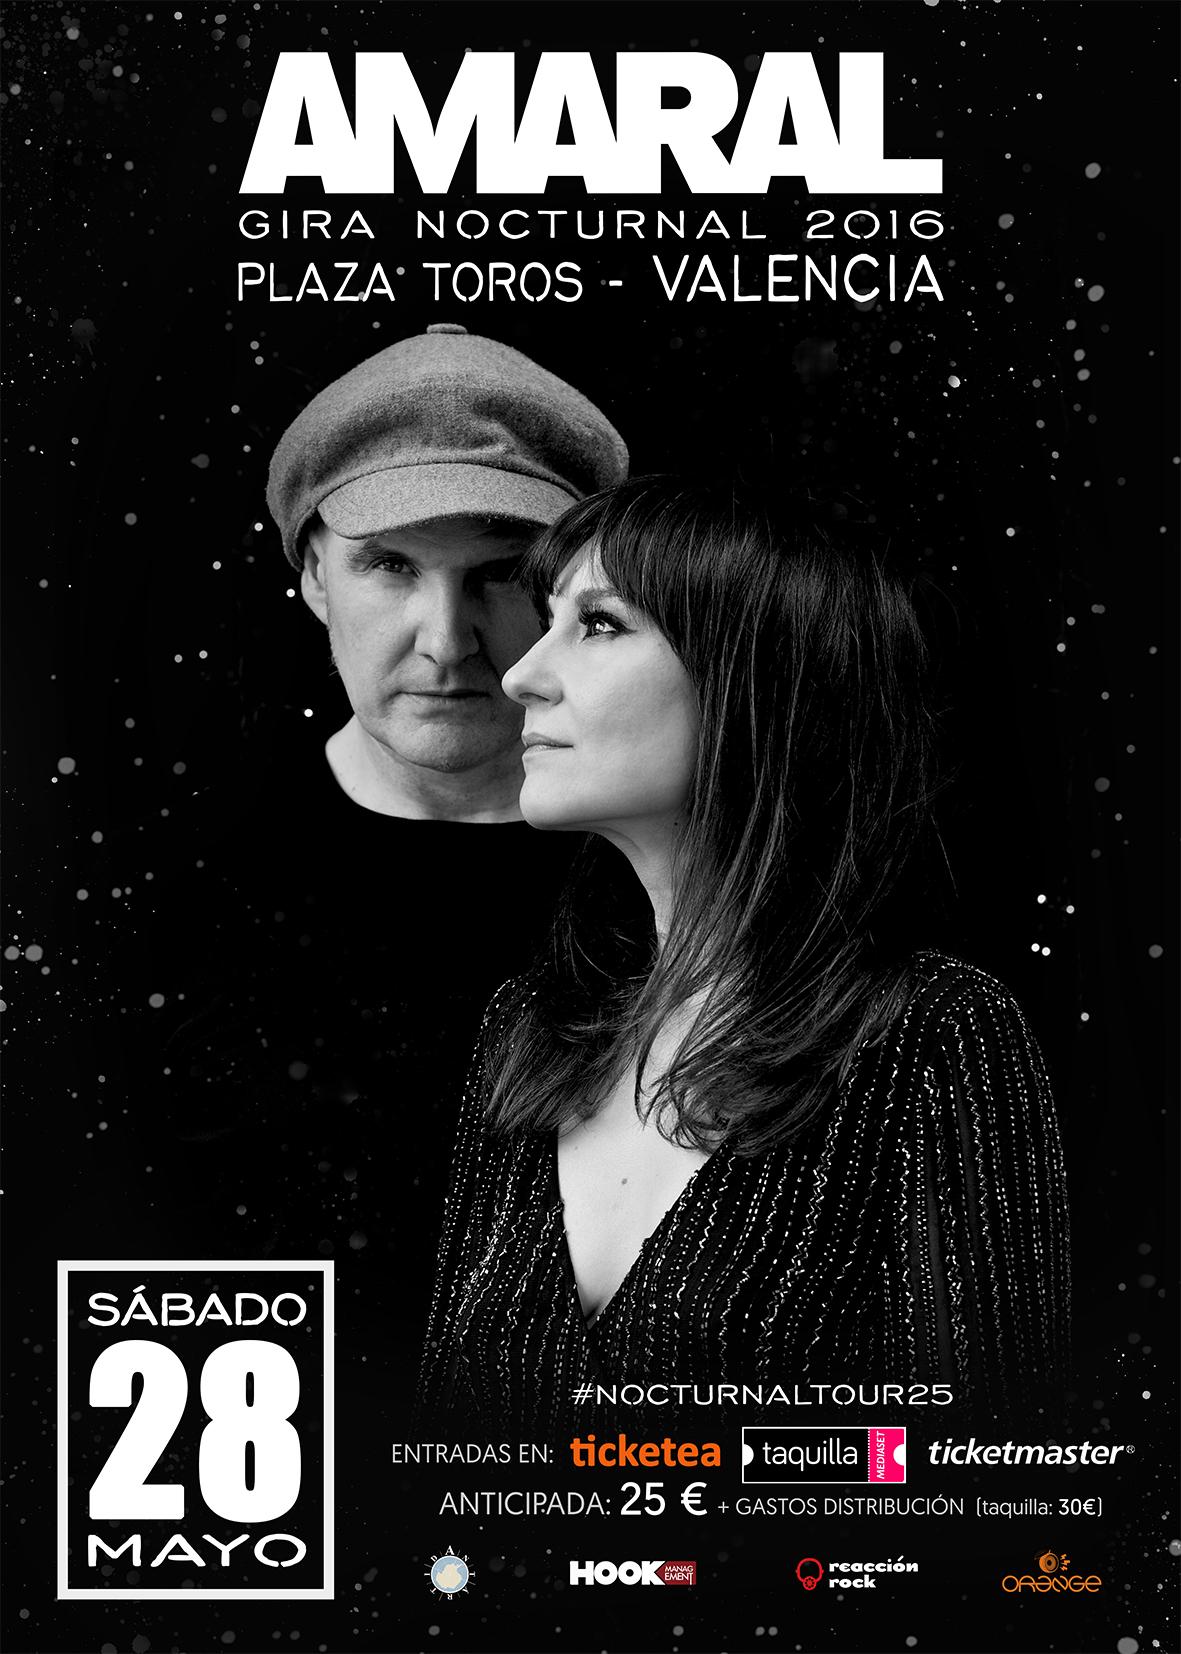 Amaral en Valencia